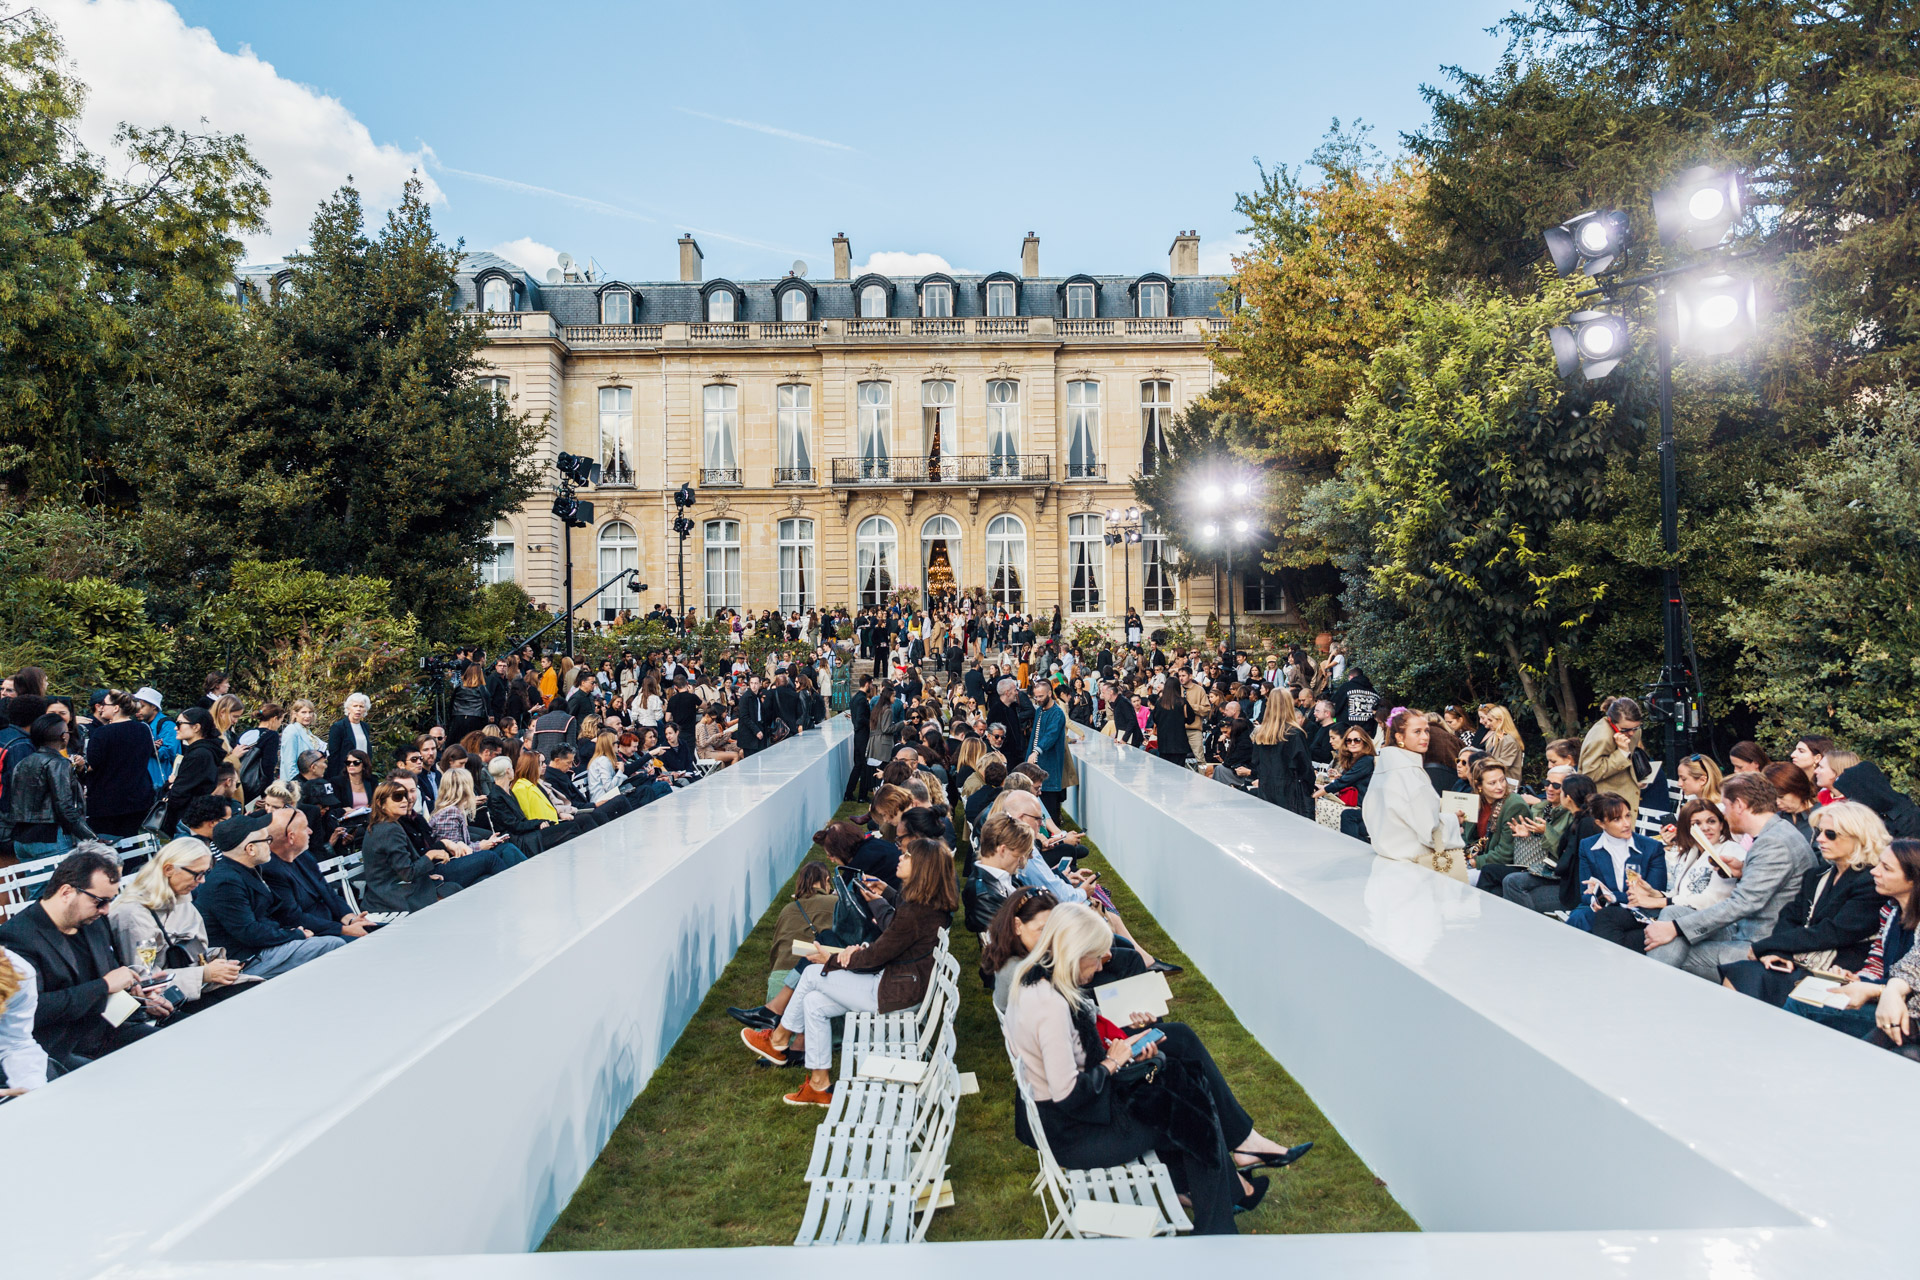 paris fashion week · ambassade d'italie